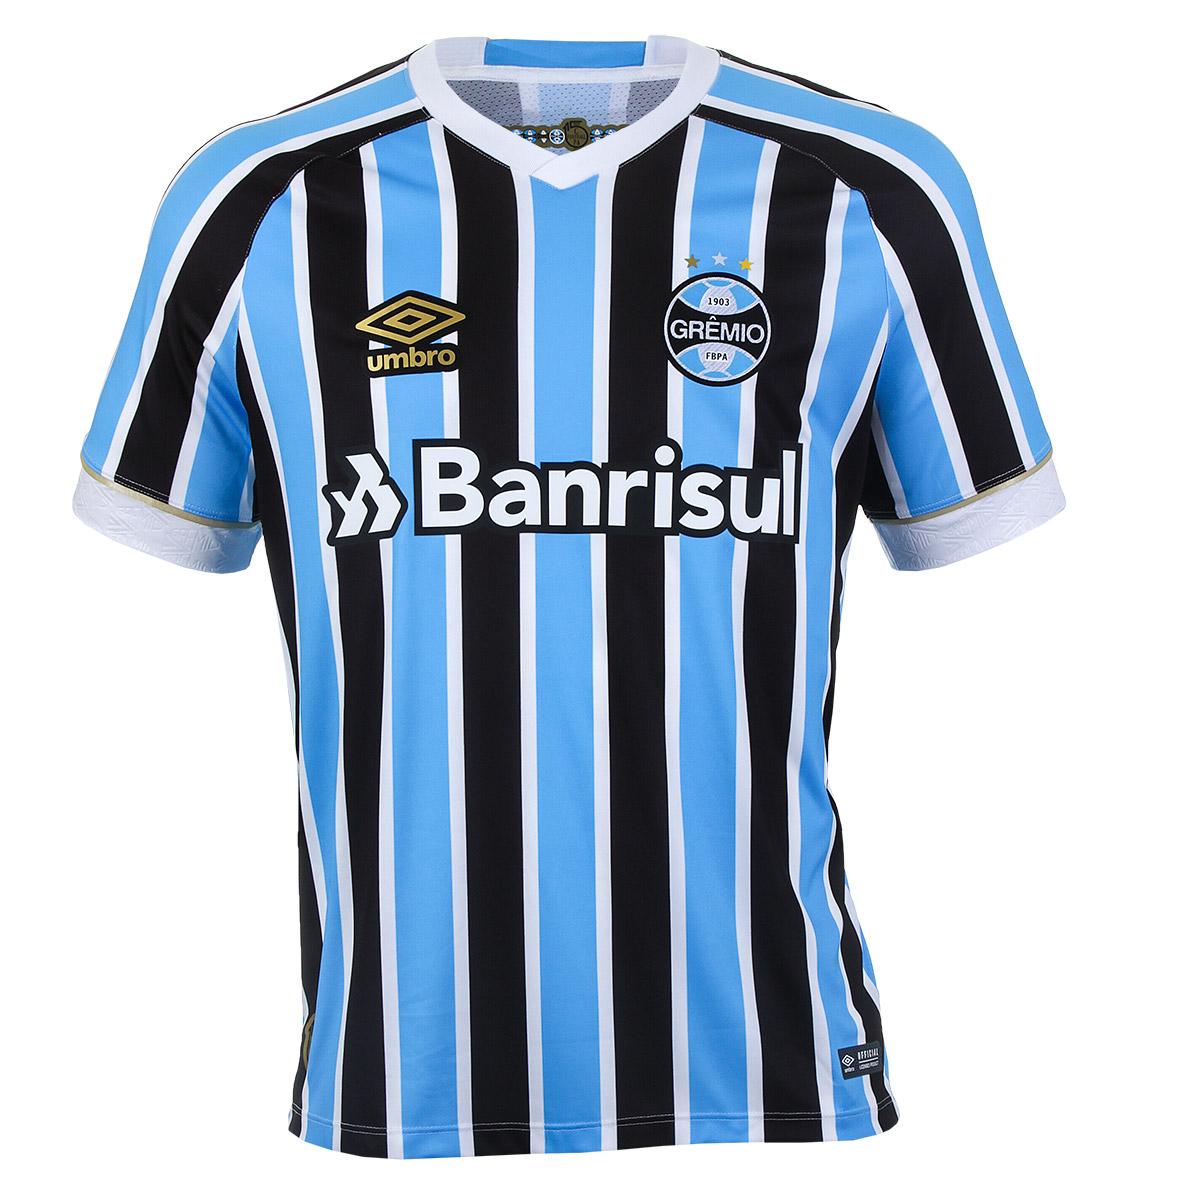 Camiseta Masc. Umbro Gremio Of. 1 2018 Futebol - Azul/Preto